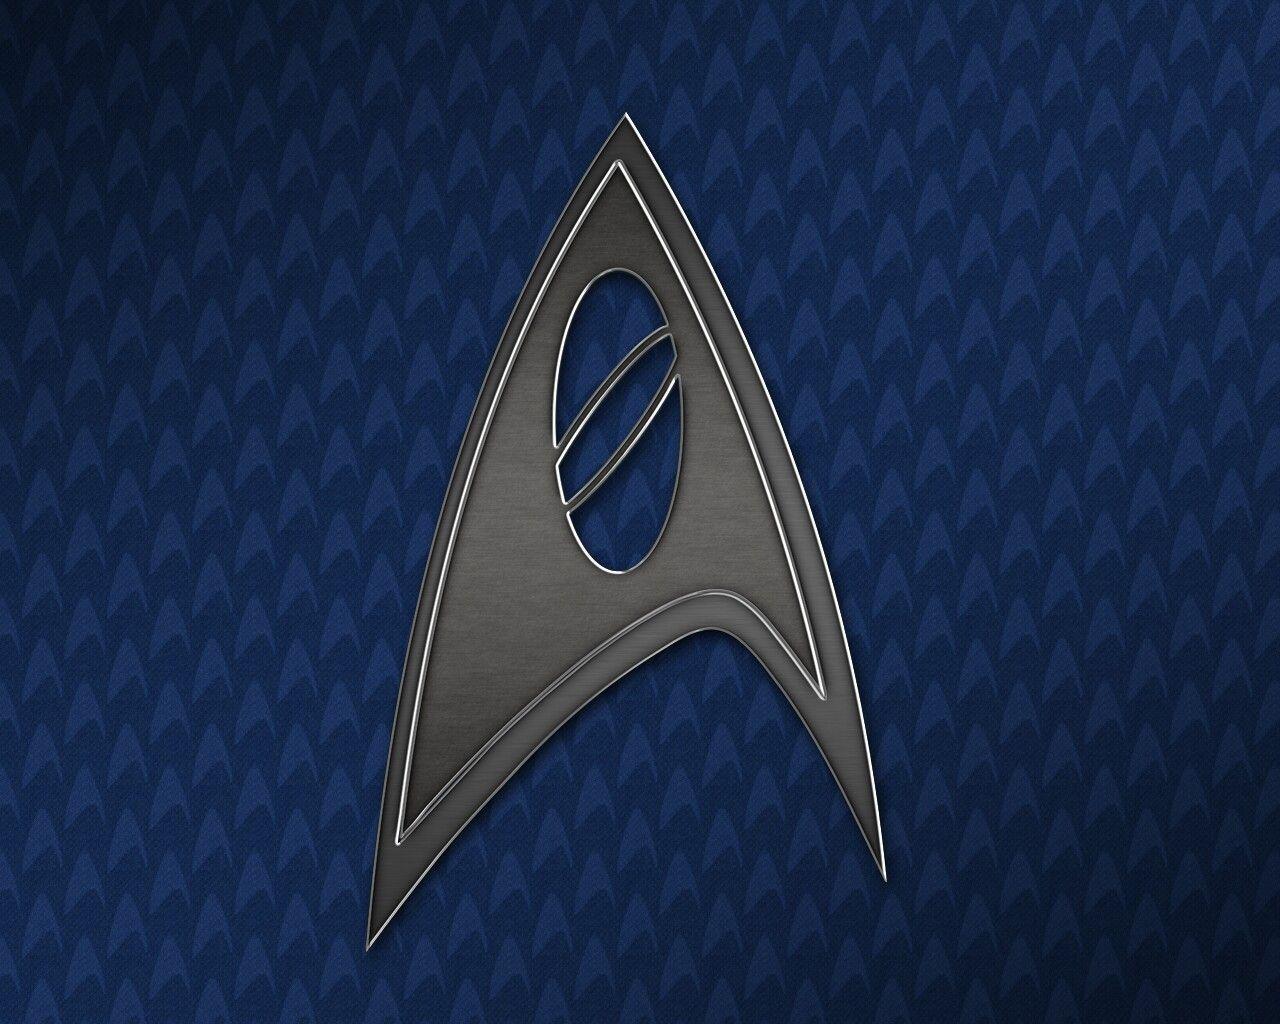 SPOCK Science Officer badge [from DeviantArt] Star